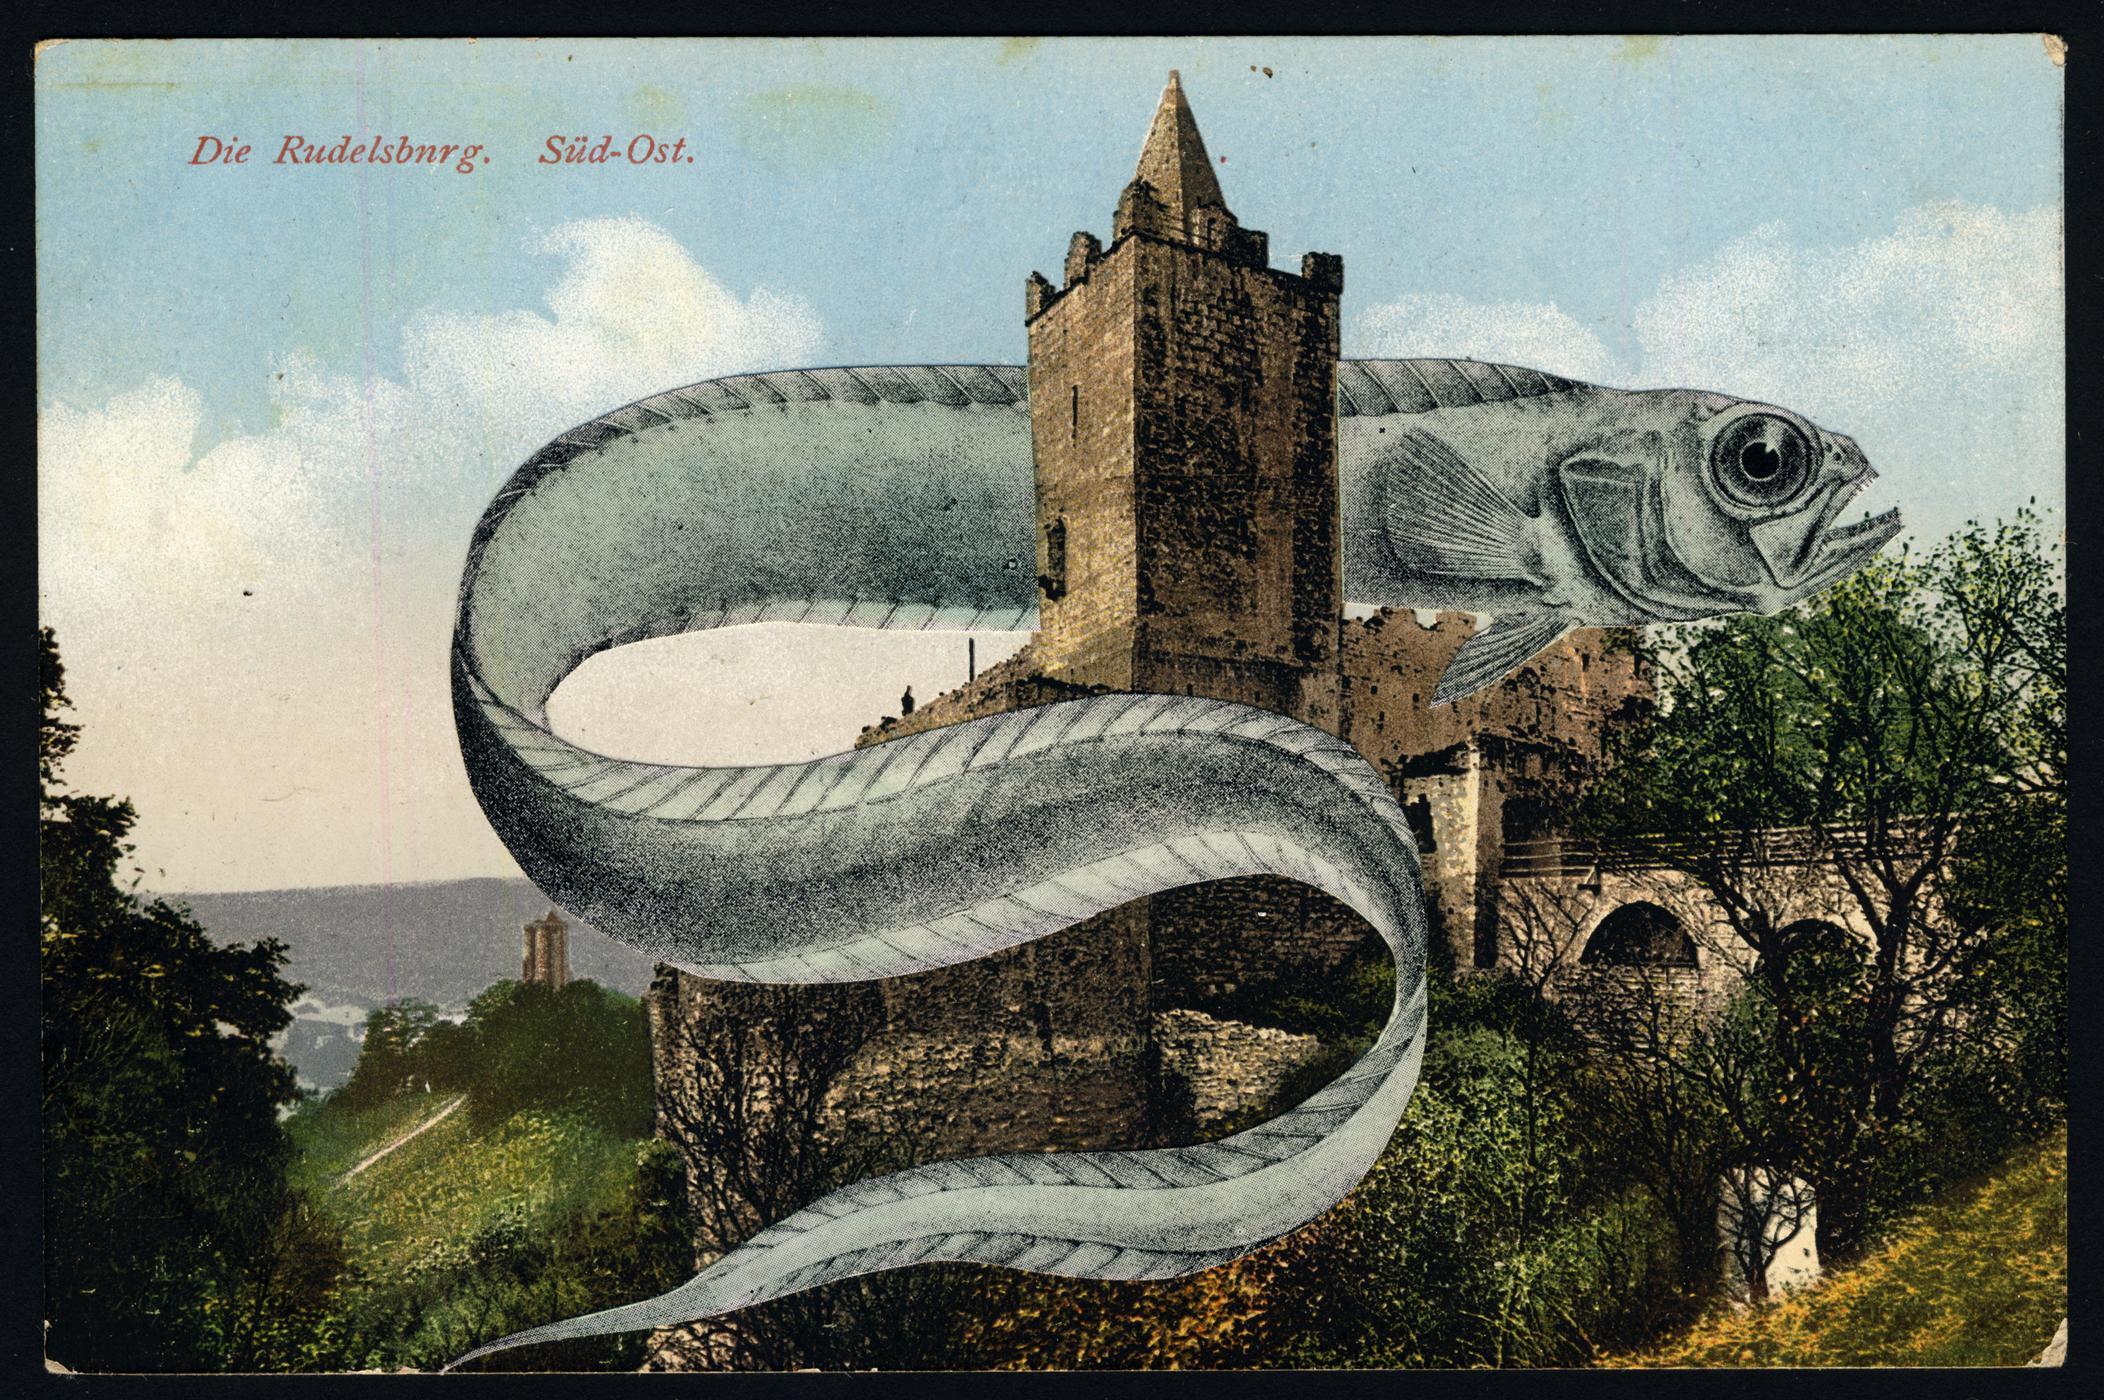 EELCHURCH 2019 Collage and Retouching fluid on vintage postcard 9x14cm KEELERTORNERO